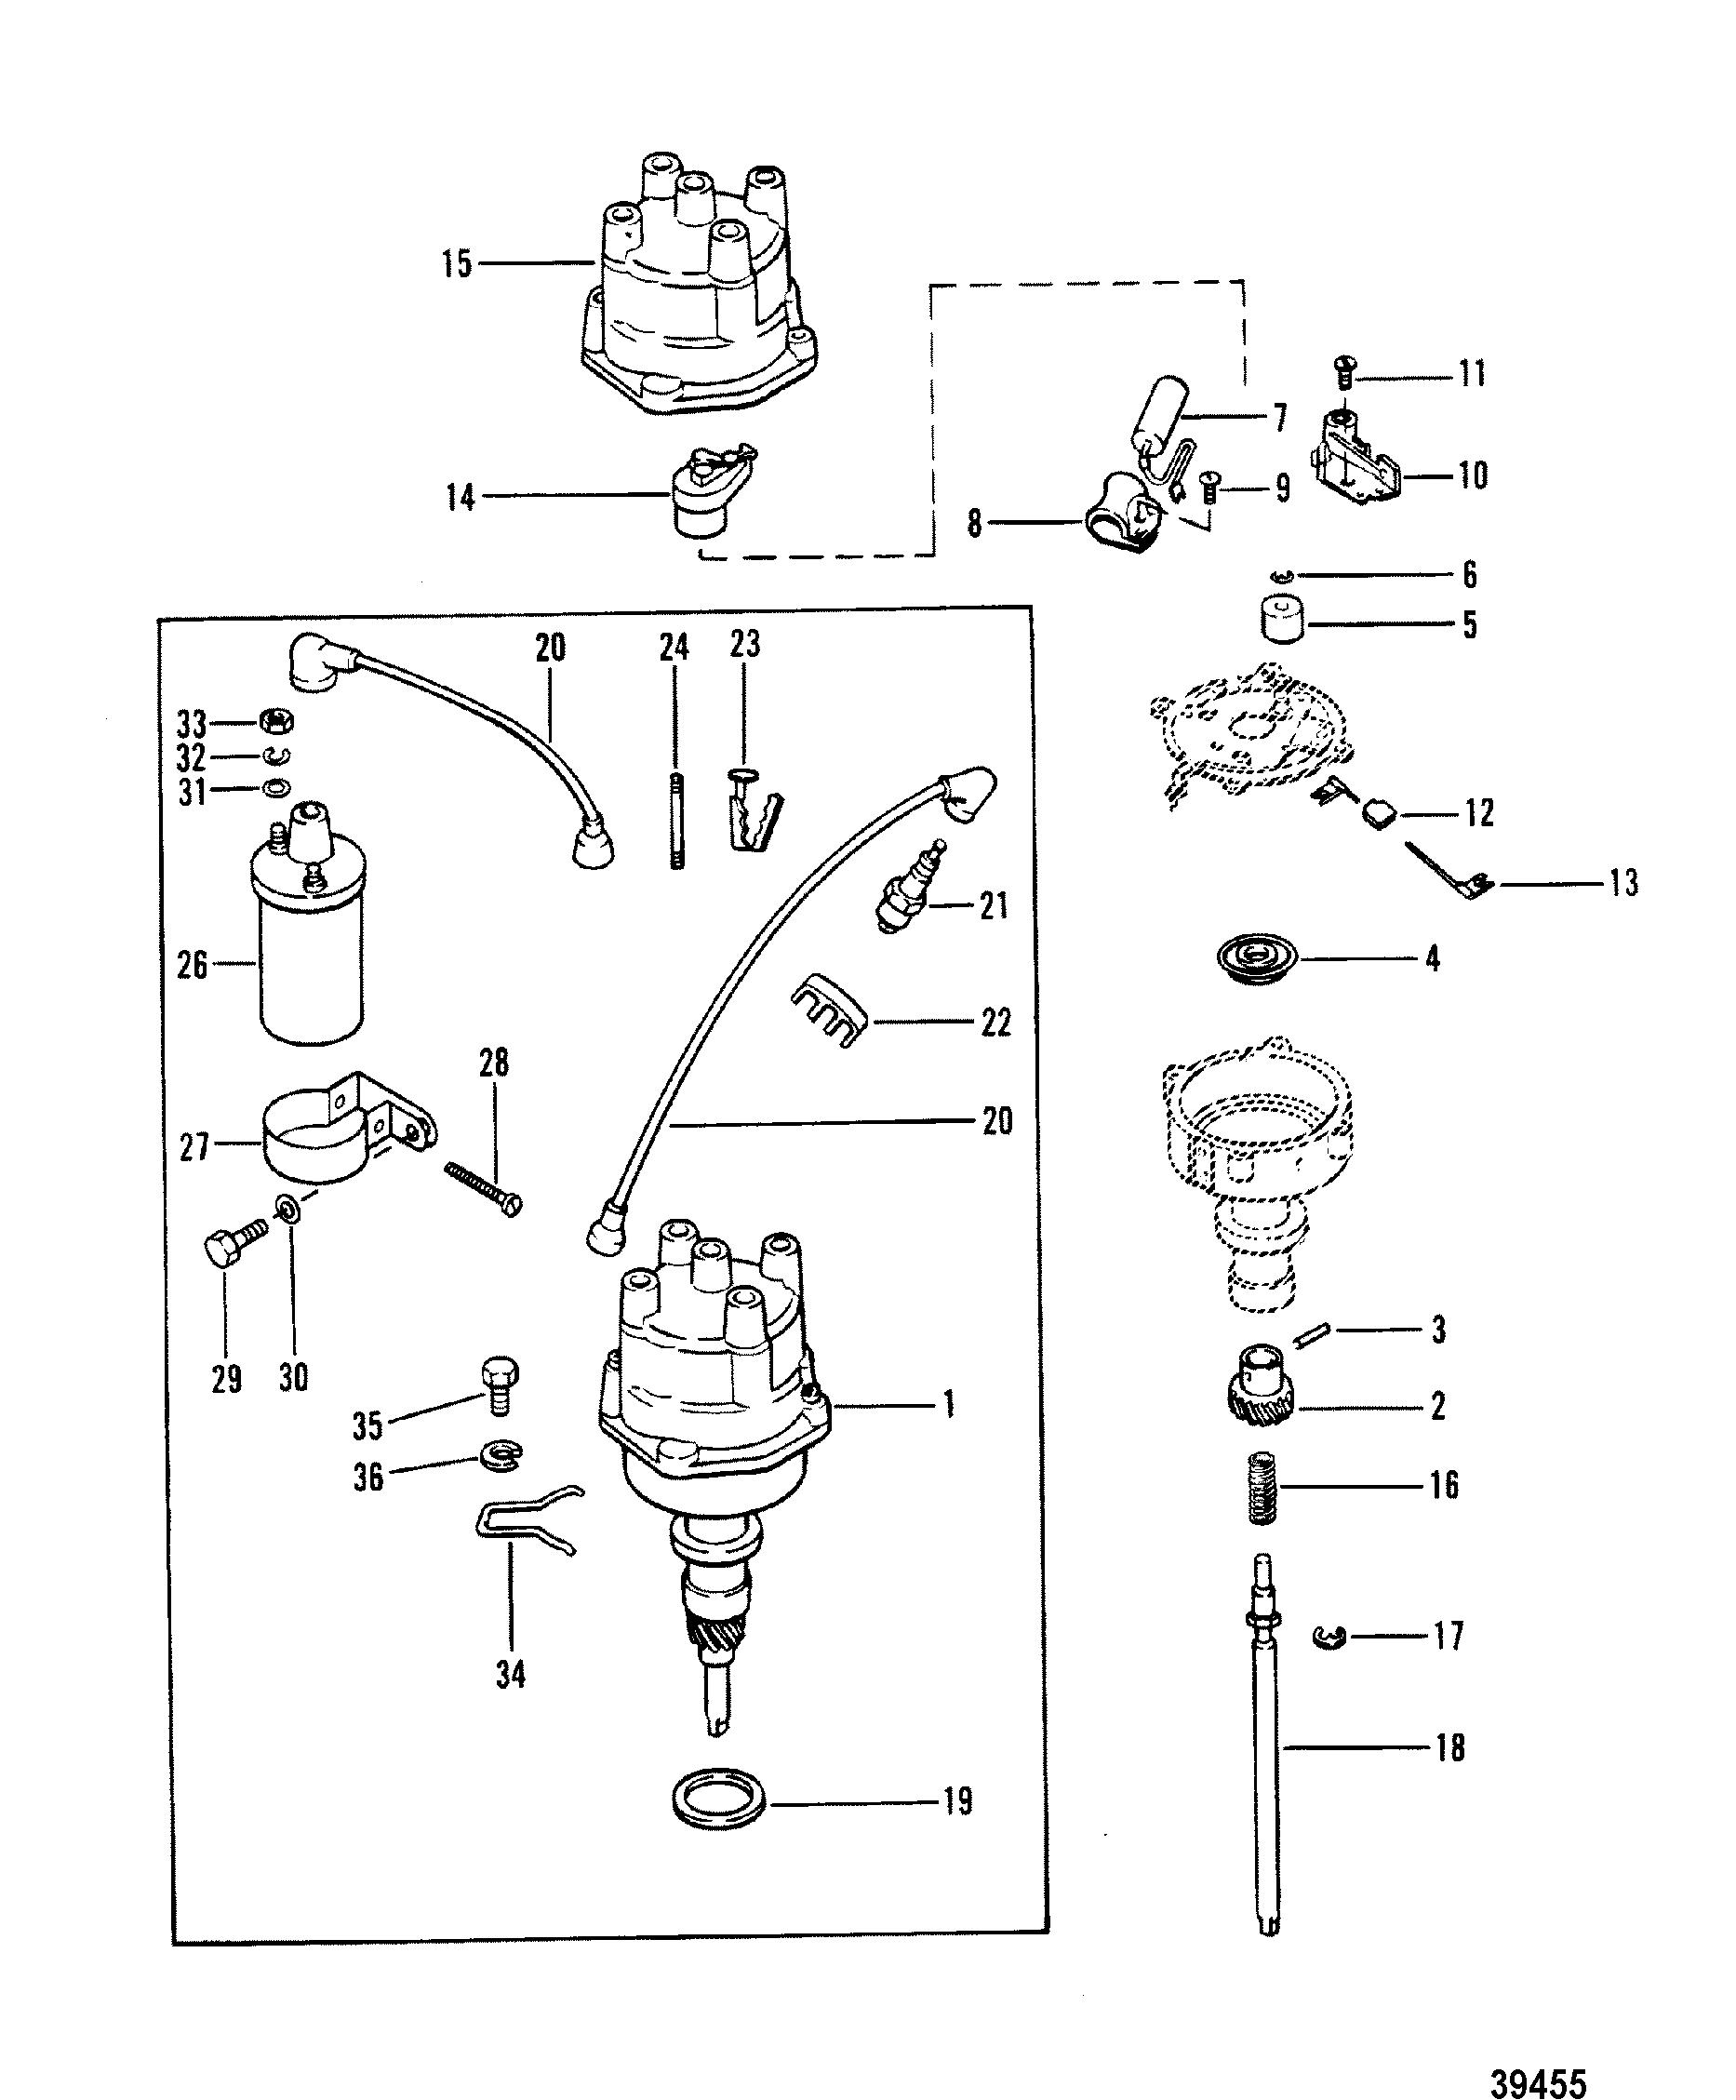 hight resolution of 4 3 mercruiser starter wiring diagram 3 0 mercruiser starter wiring 165 hp mercruiser heat exchanger